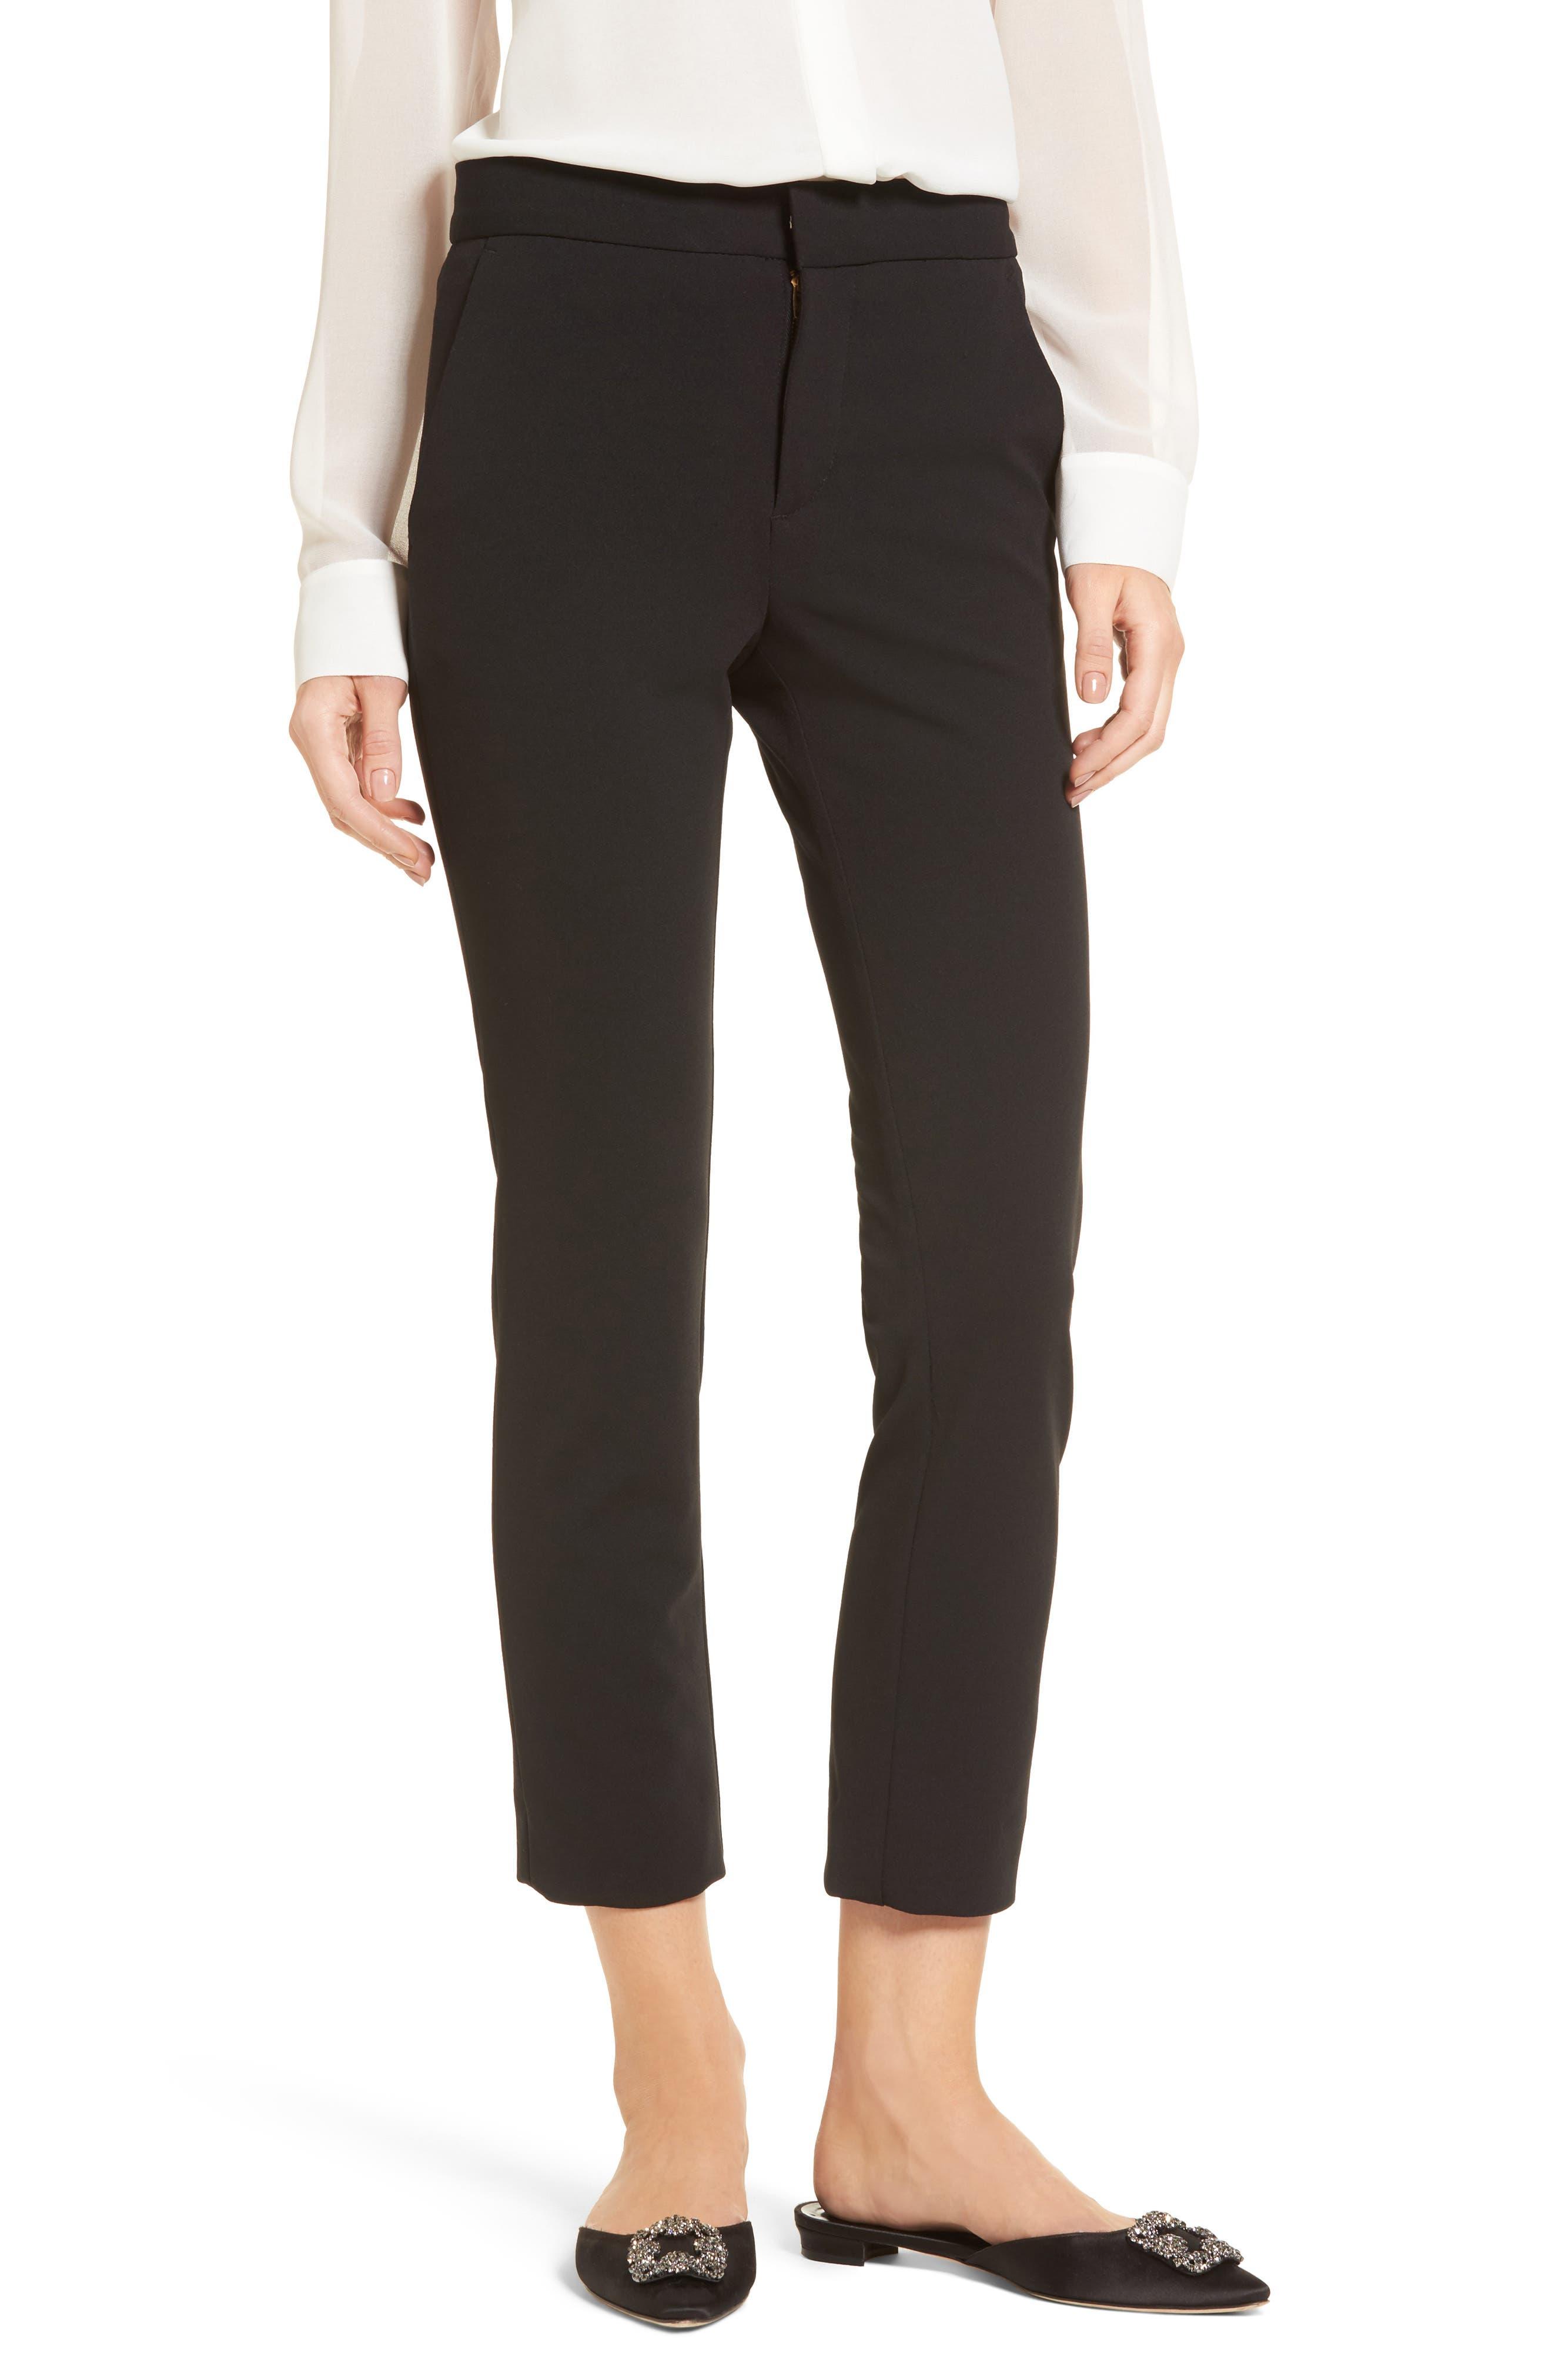 Lou Lou High Waist Crop Slim Trousers,                         Main,                         color, 001